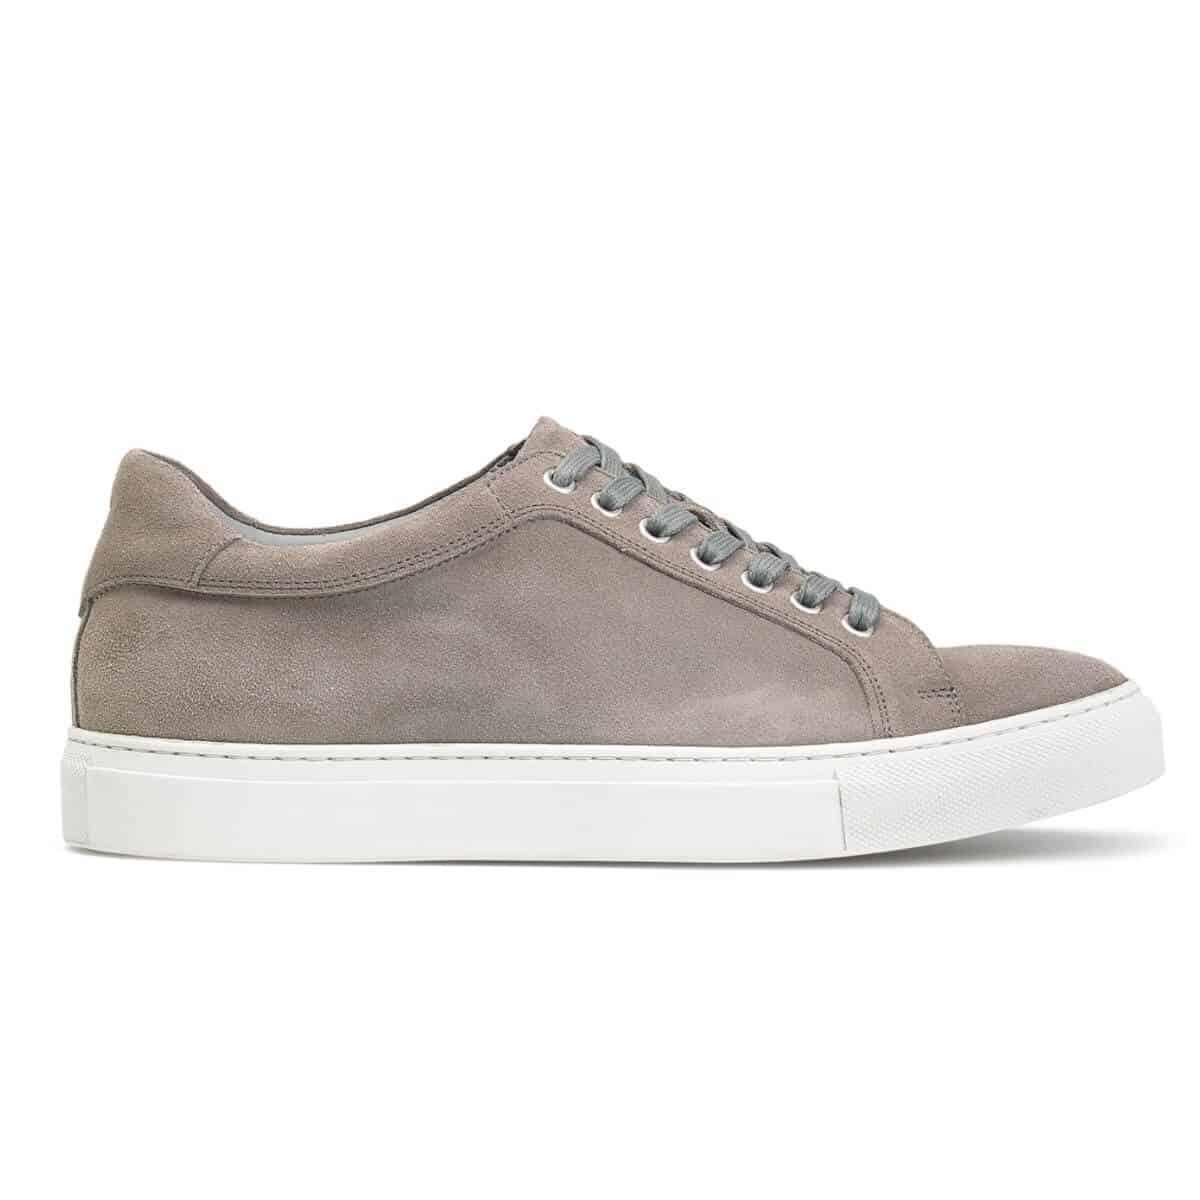 Trask Rigby light grey suede sneaker.